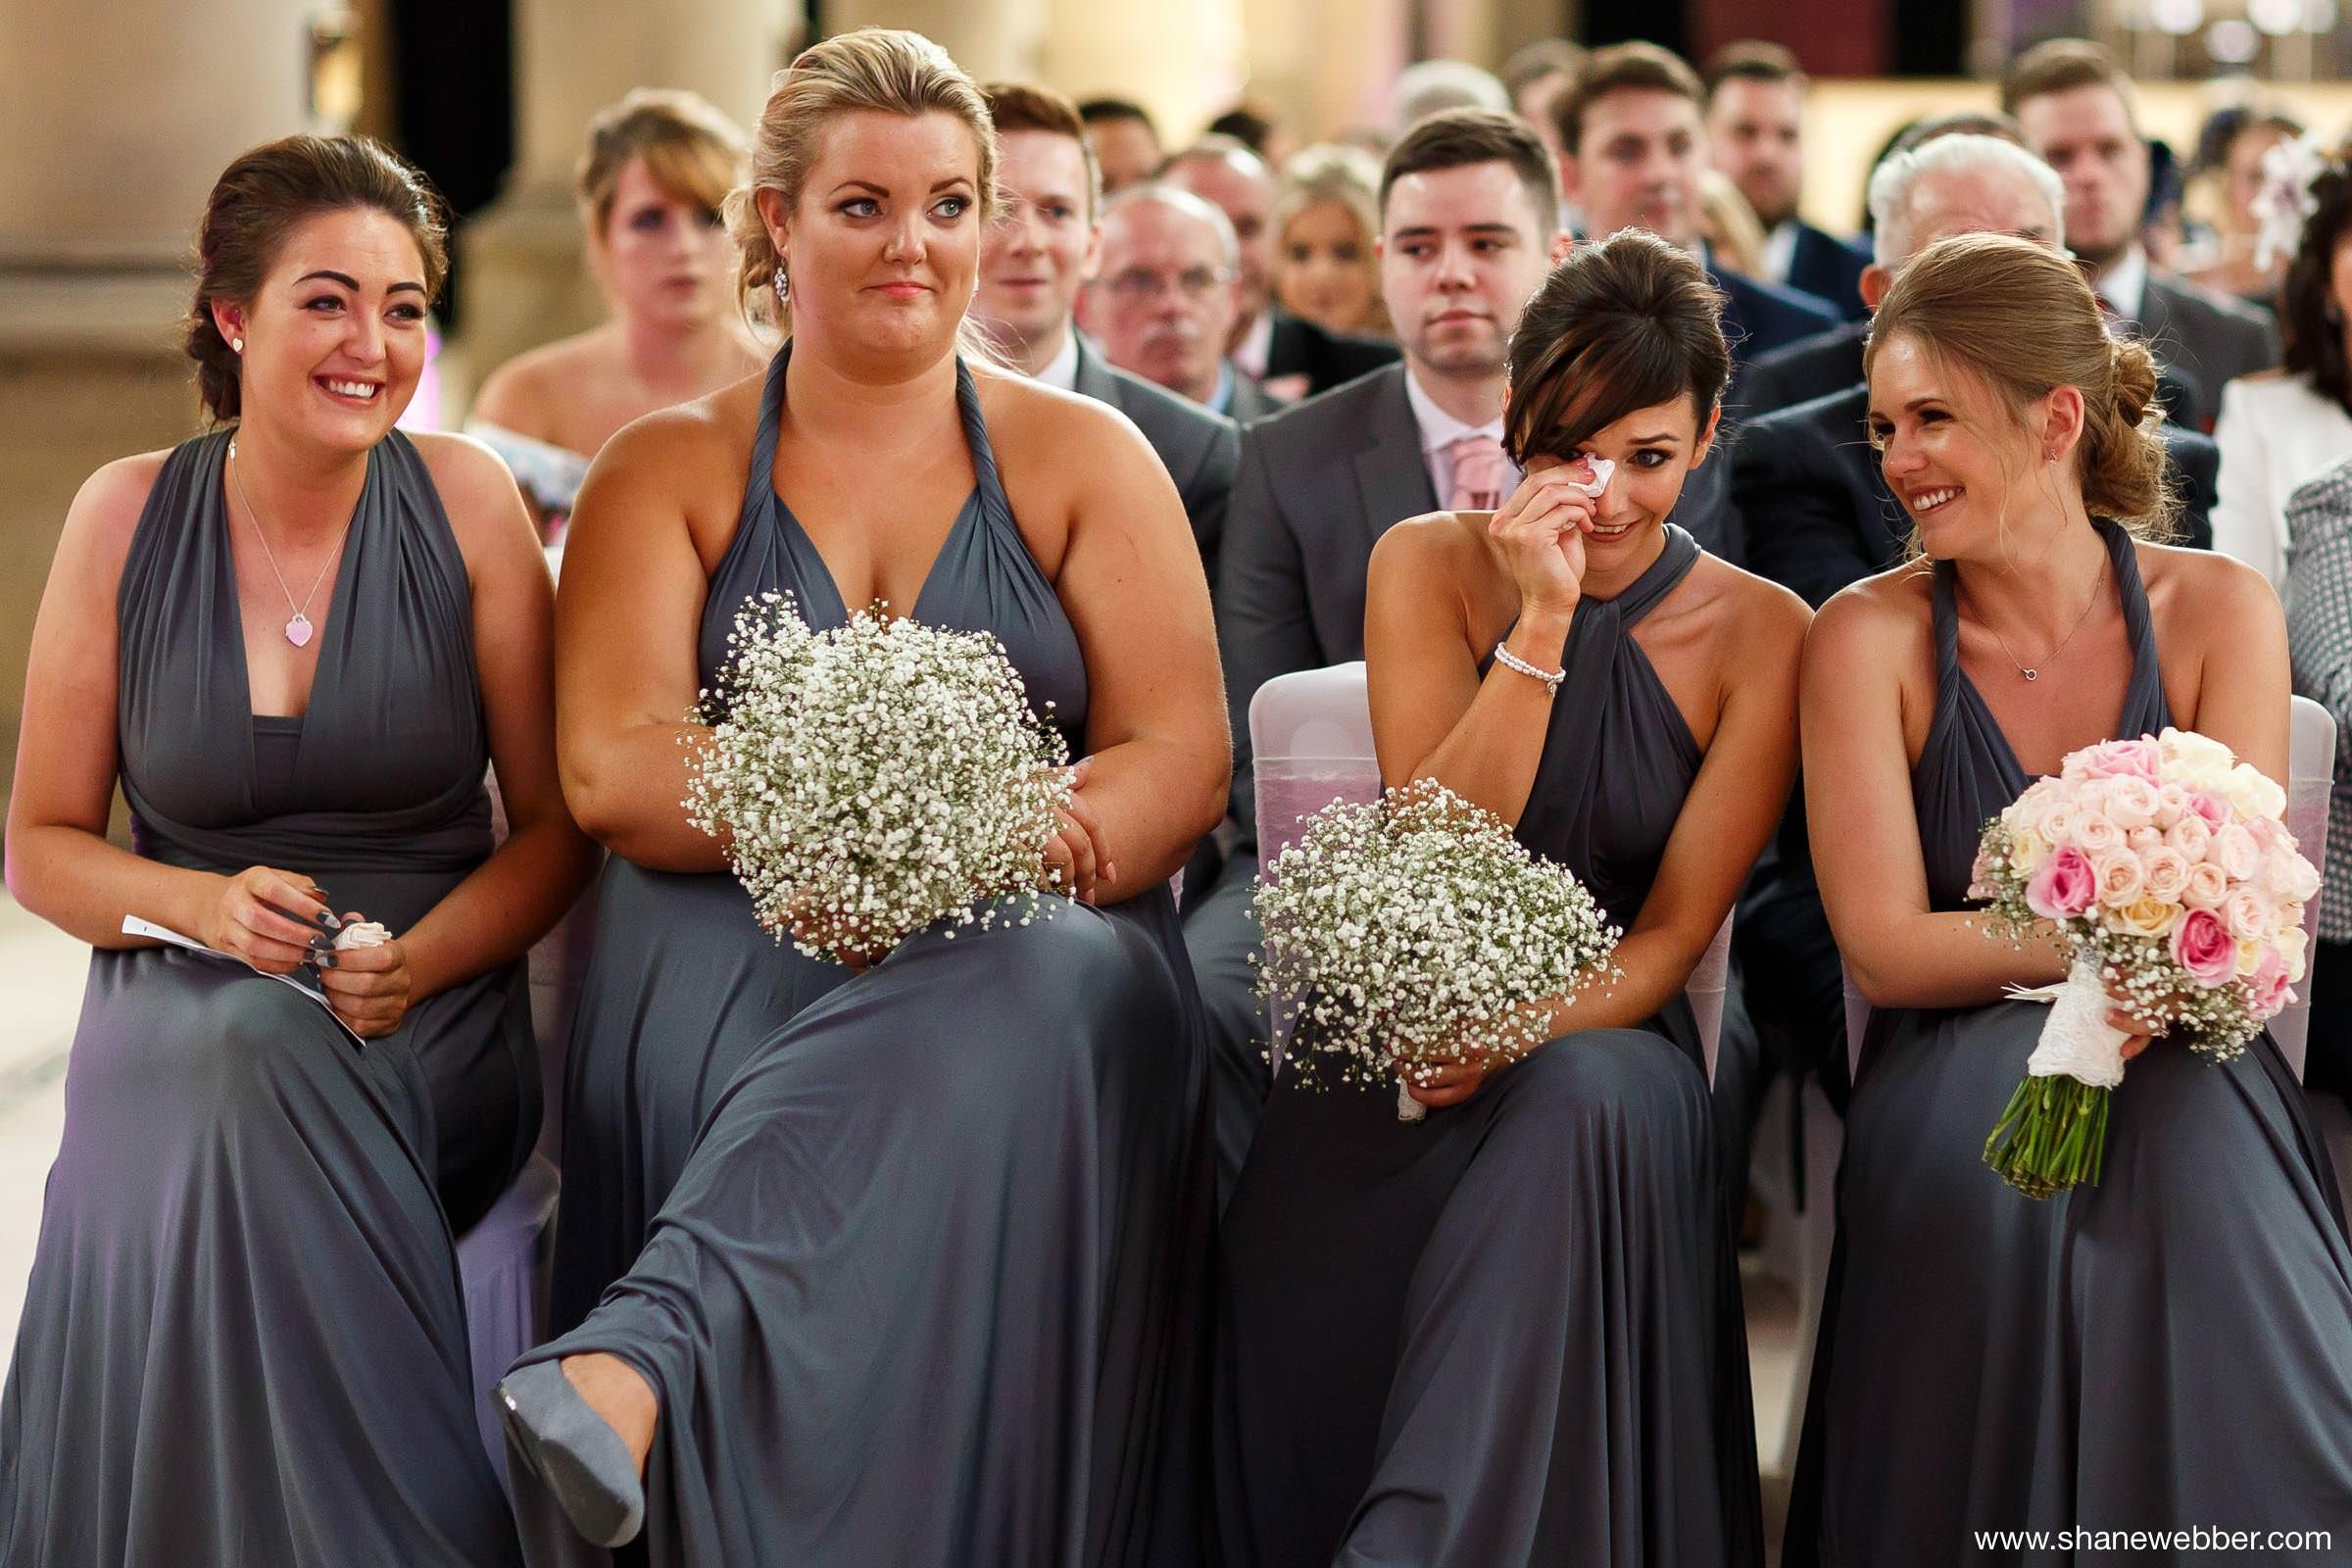 Emotional wedding ceremony photos